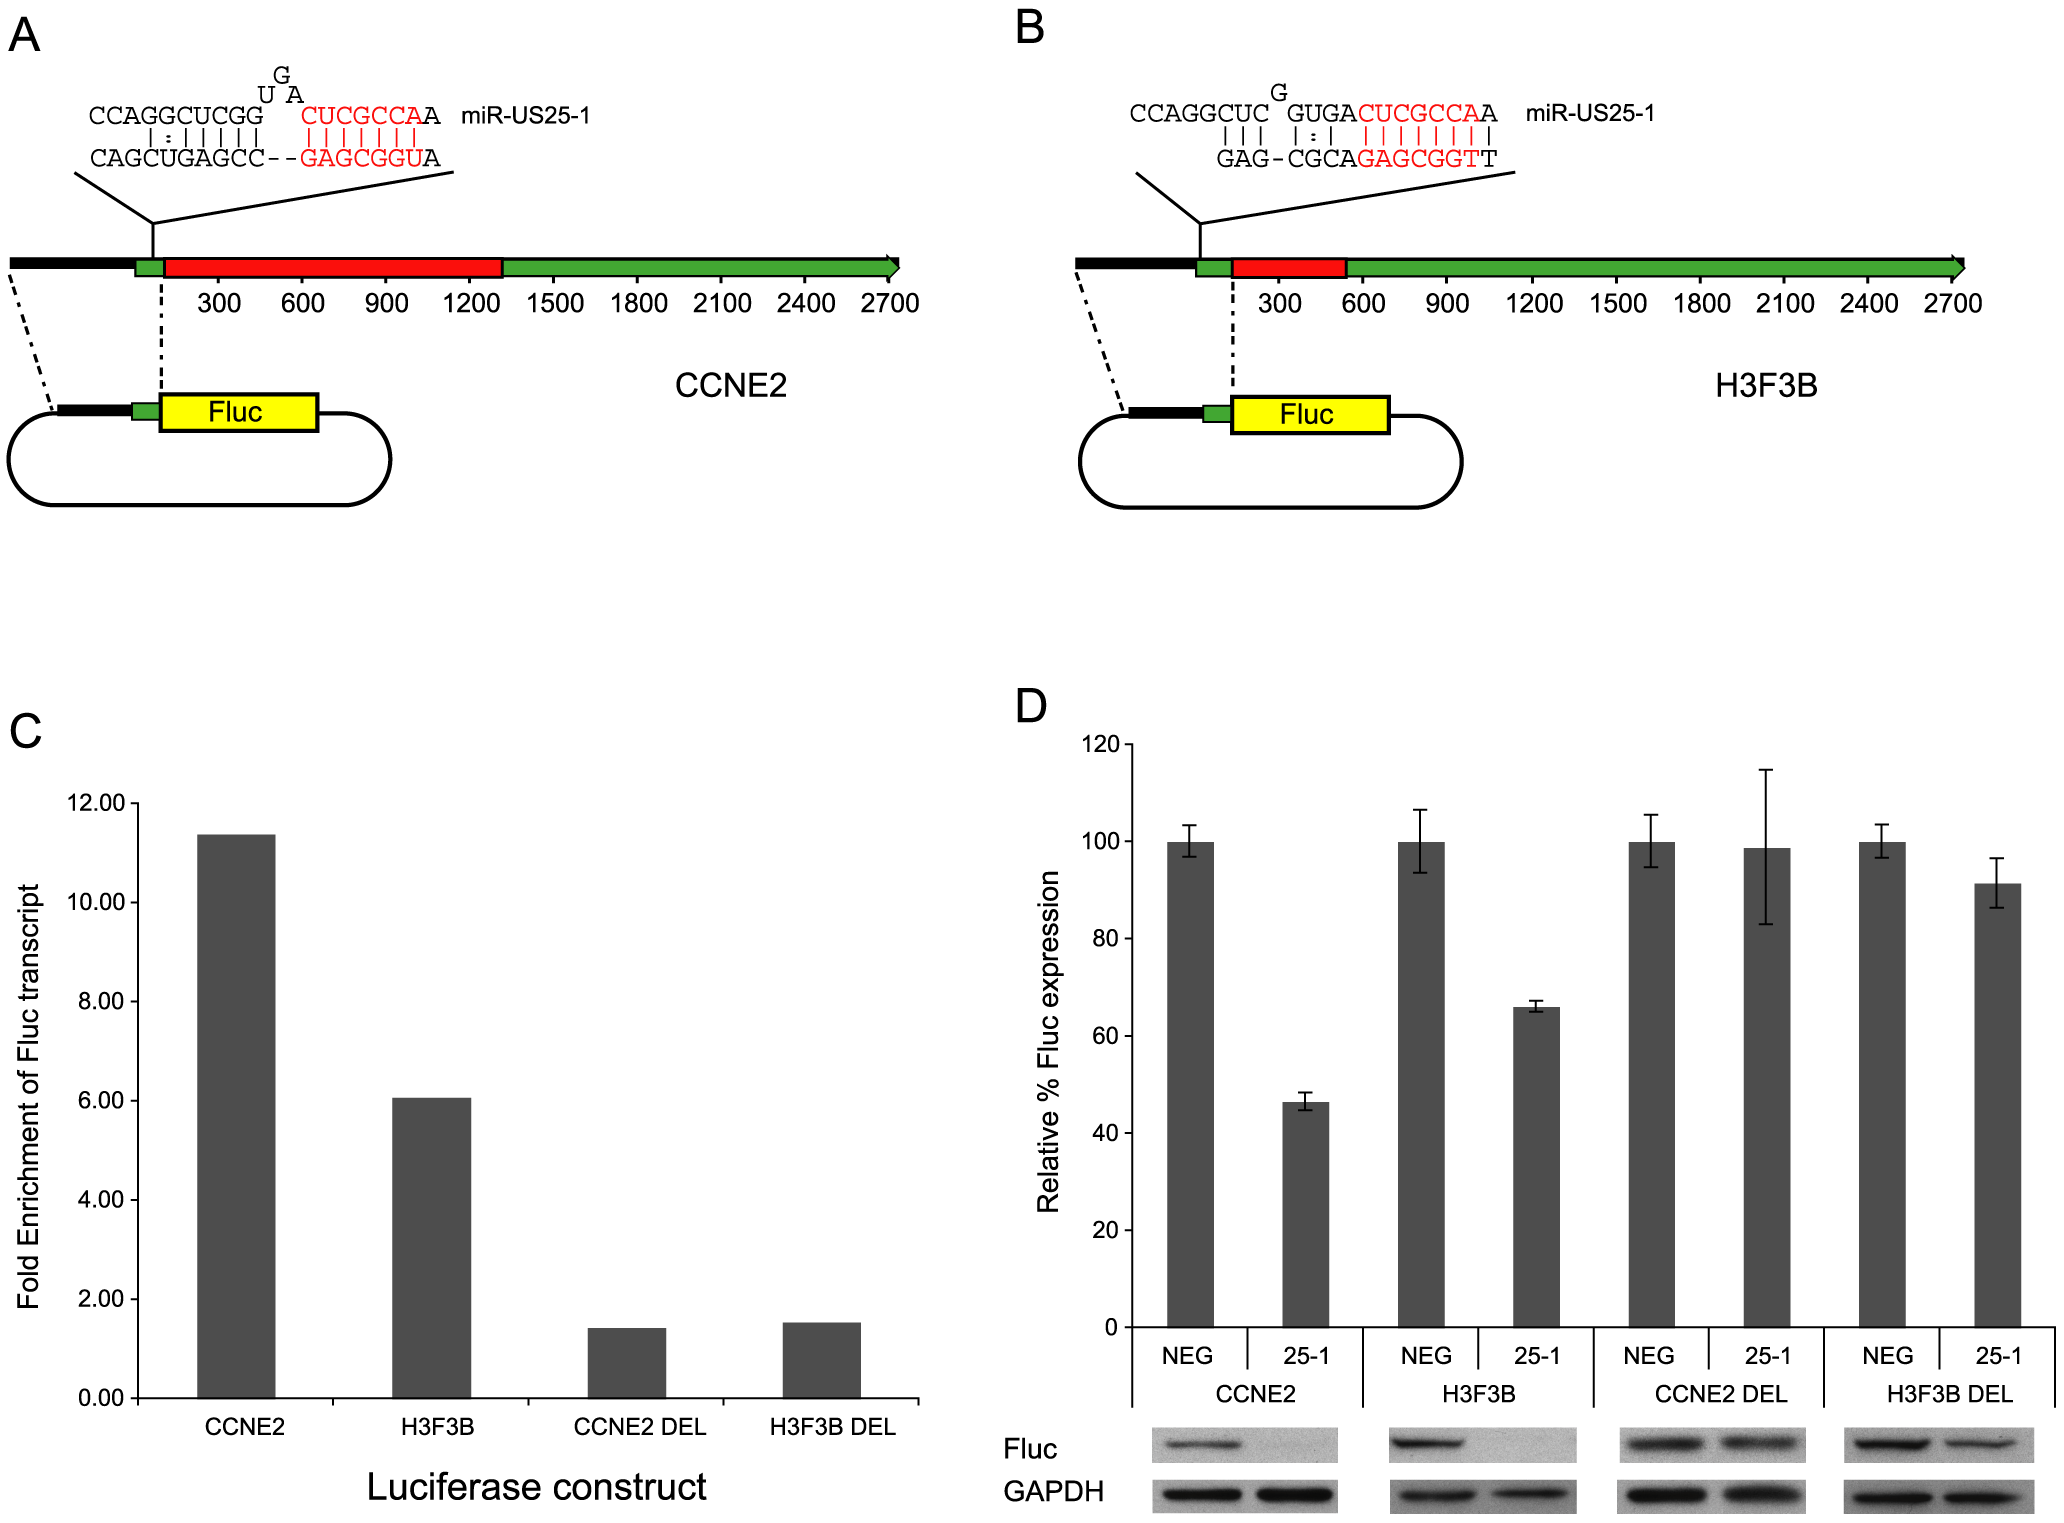 miR-US25-1 represses gene expression.